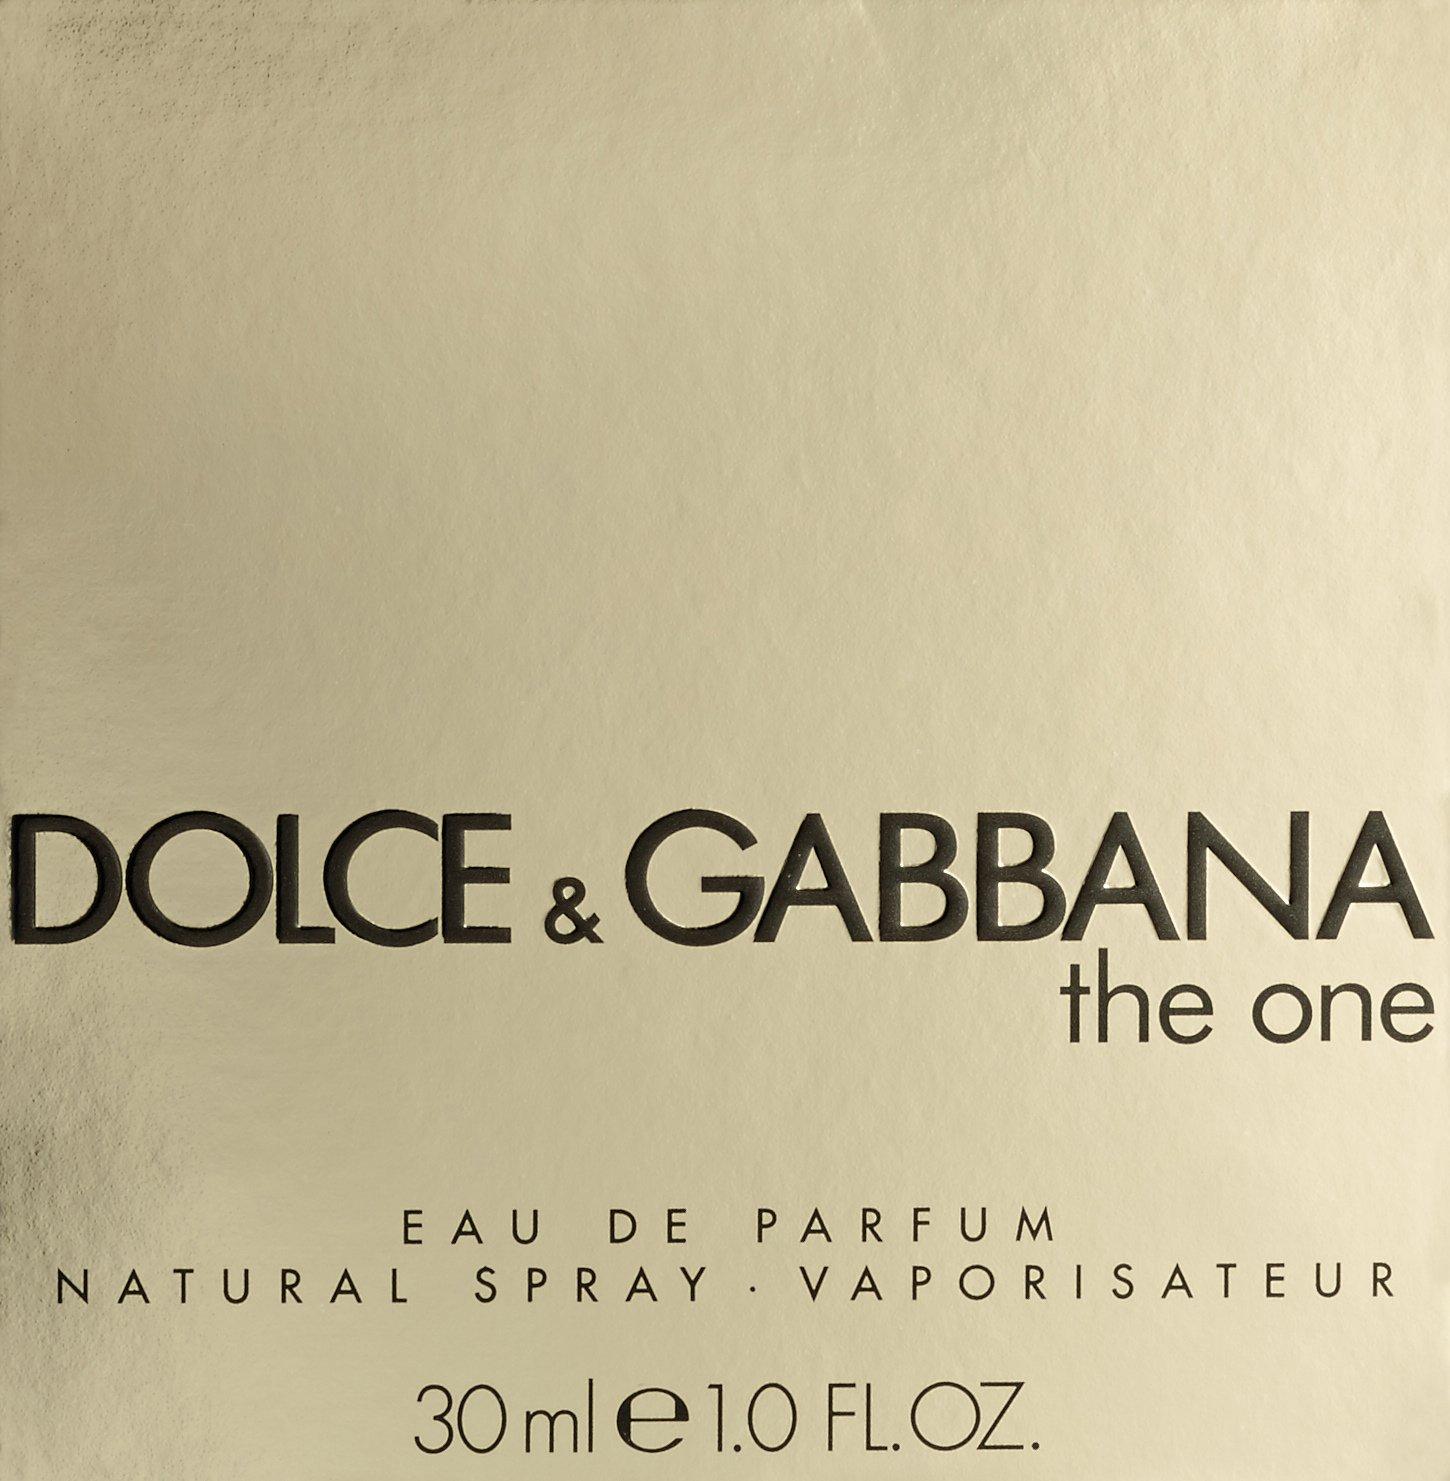 Dolce Gabbana The One For Women. Eau De Parfum Spray 1-Ounce